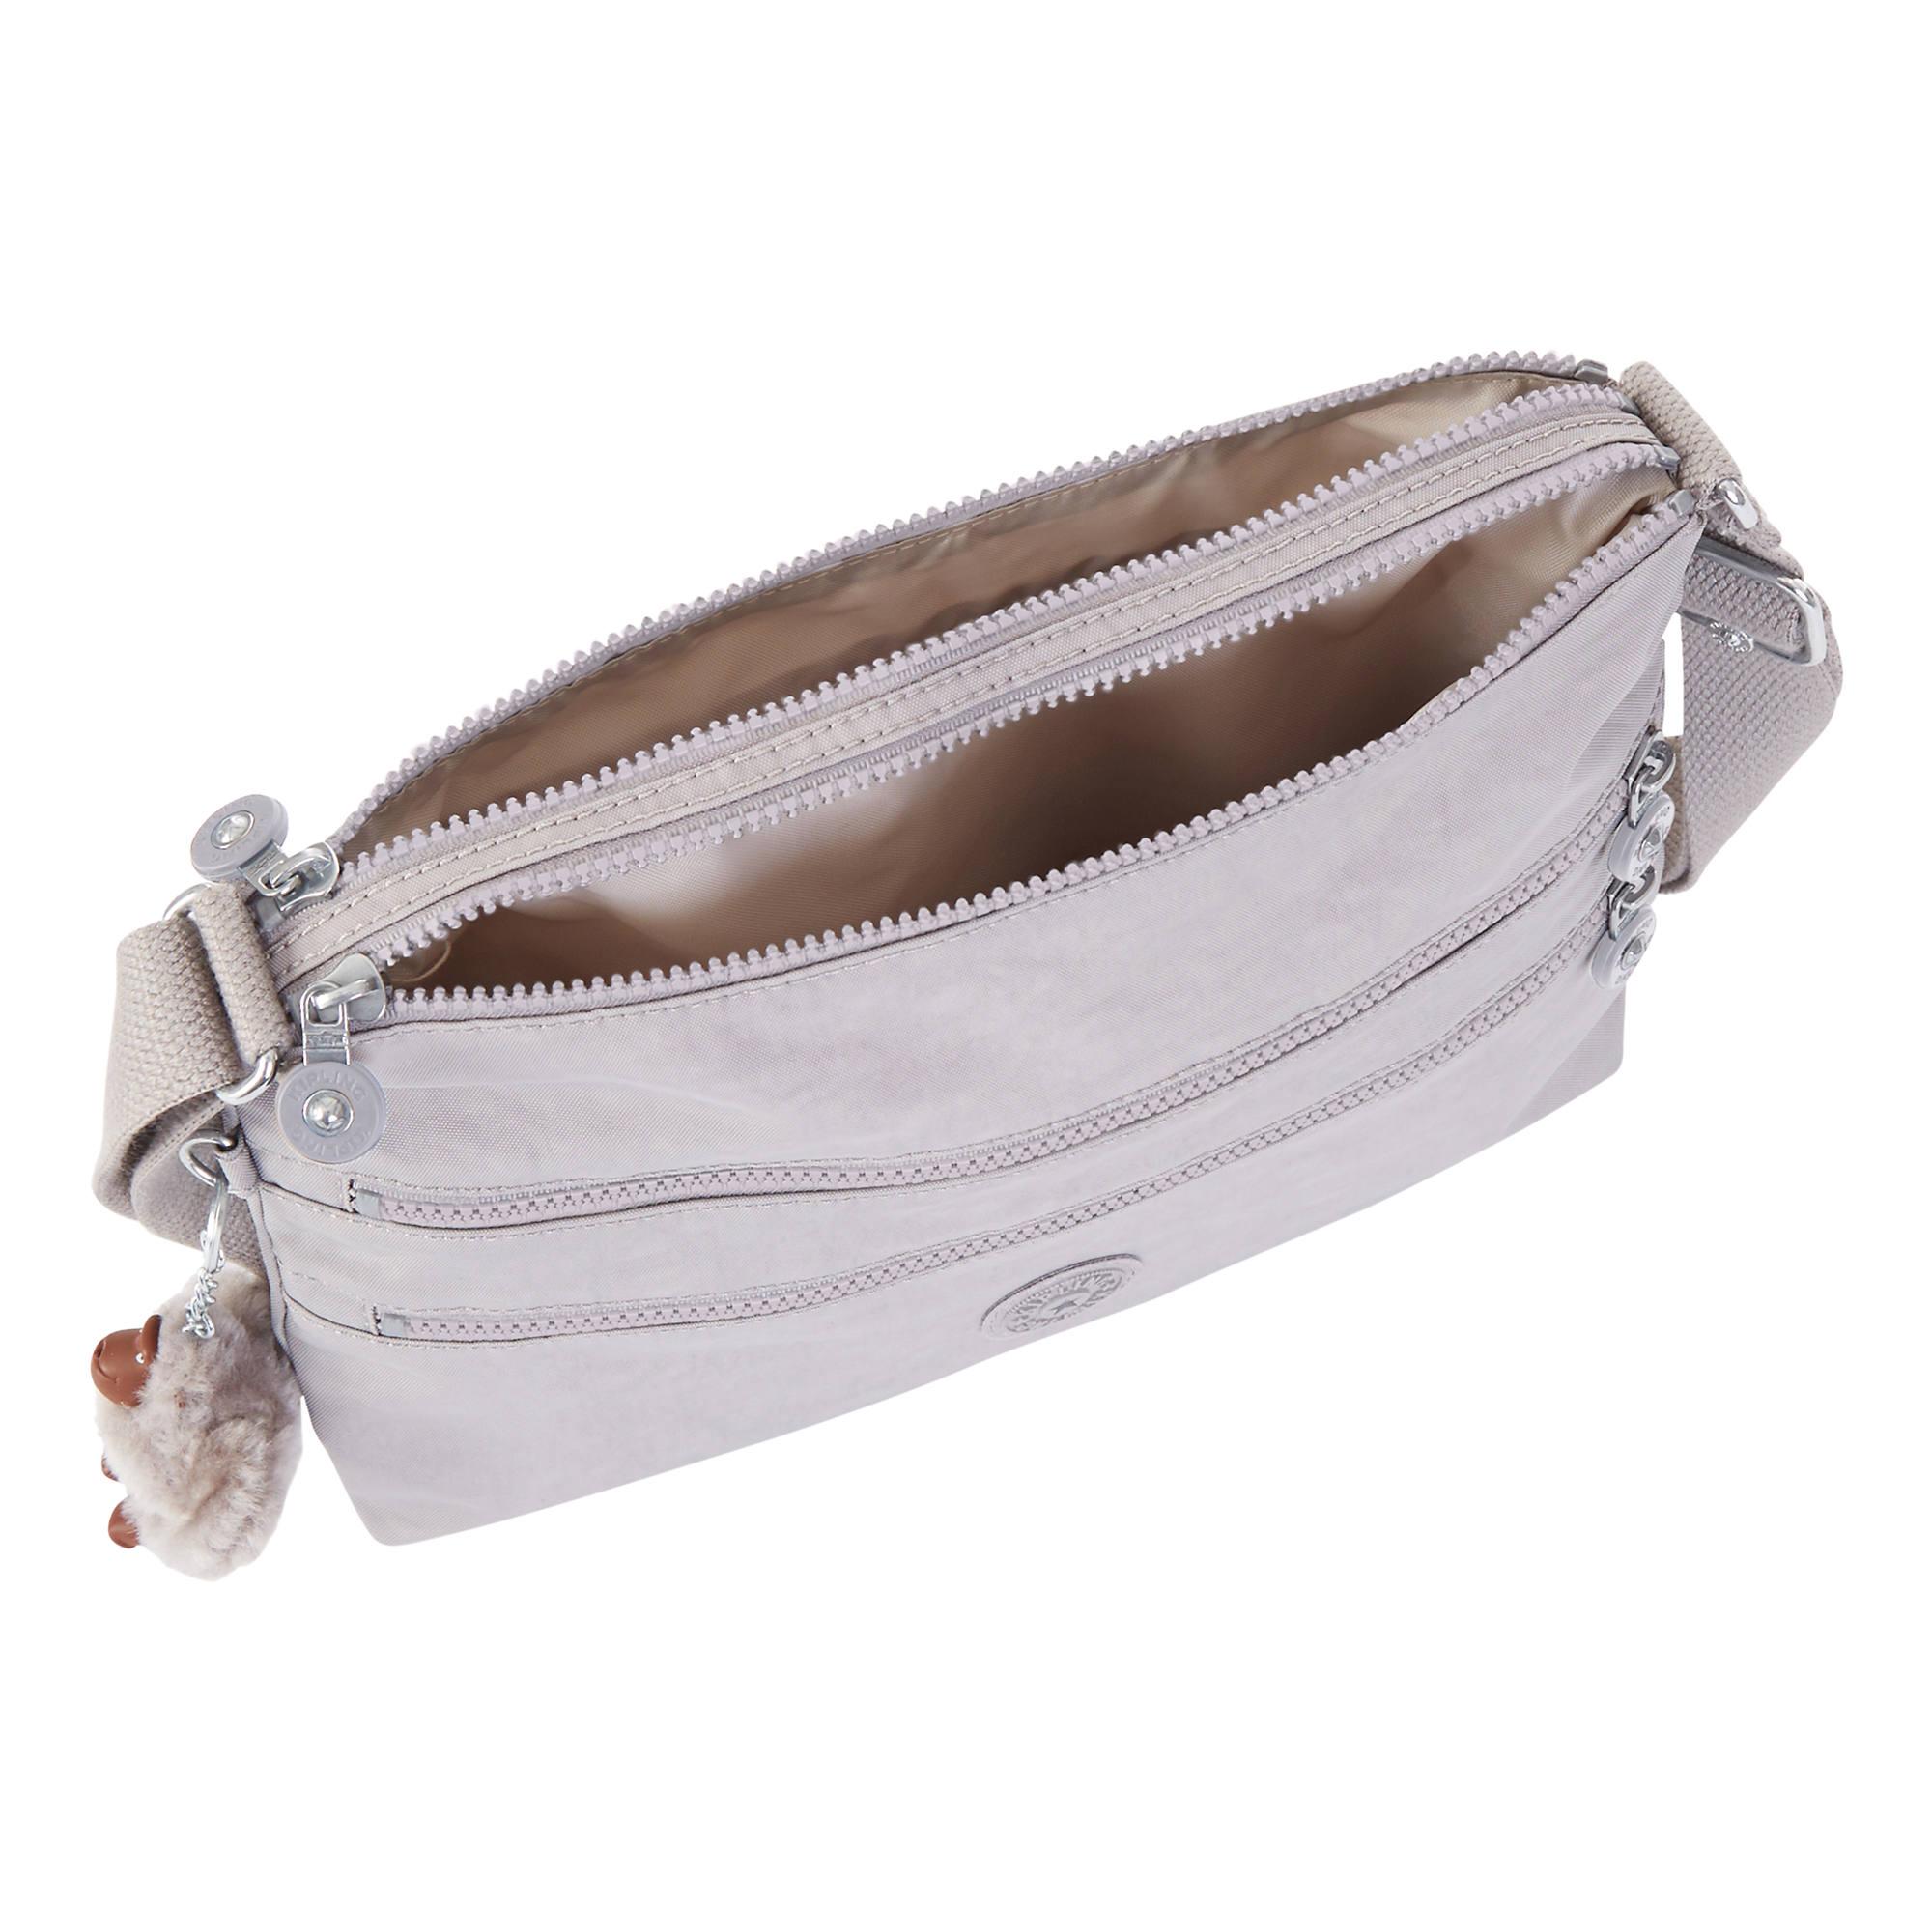 Kipling-Alvar-Metallic-Crossbody-Bag miniature 38